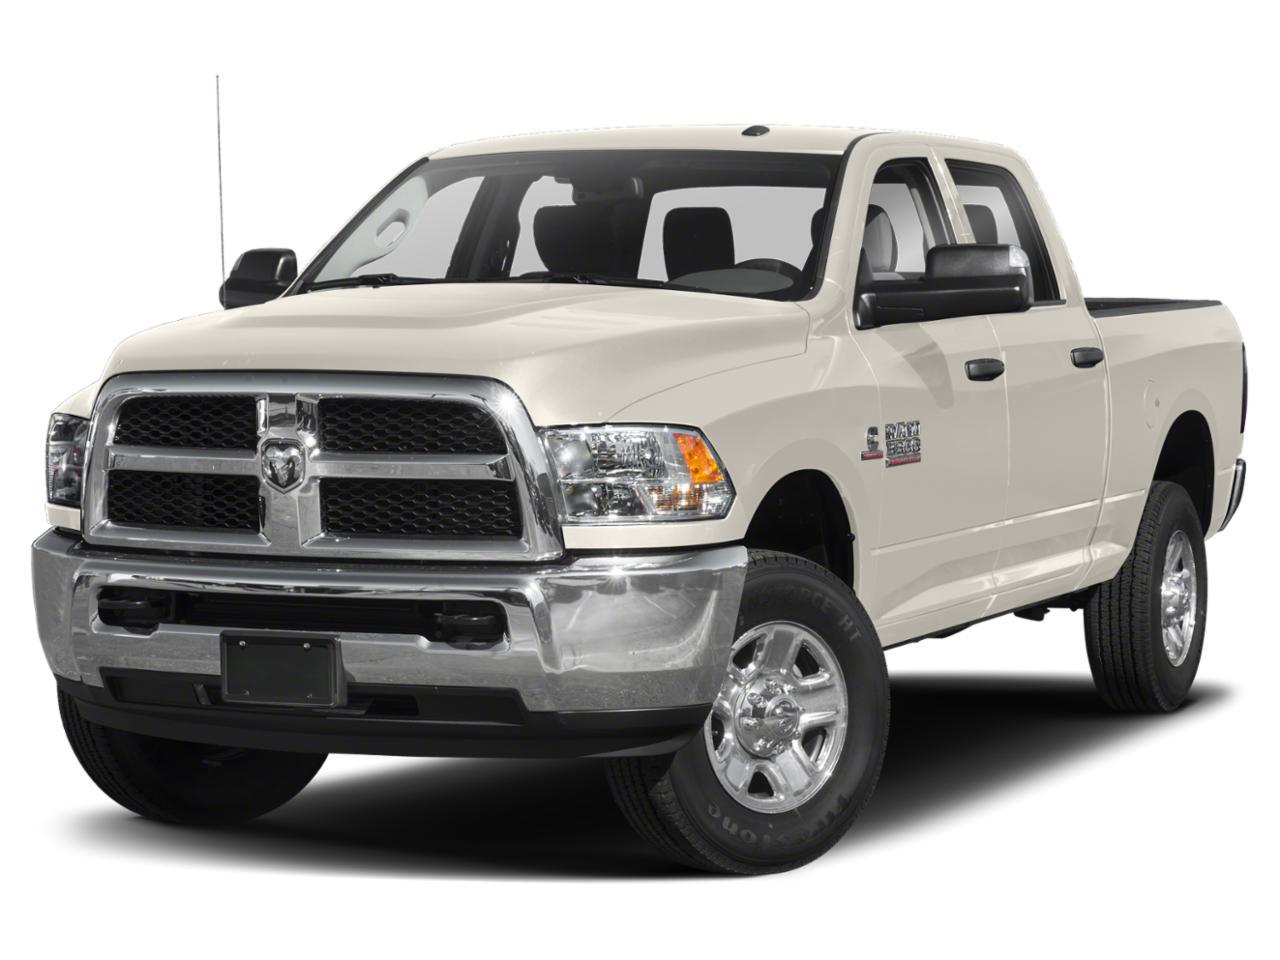 2018 Ram 3500 Vehicle Photo in Gardner, MA 01440